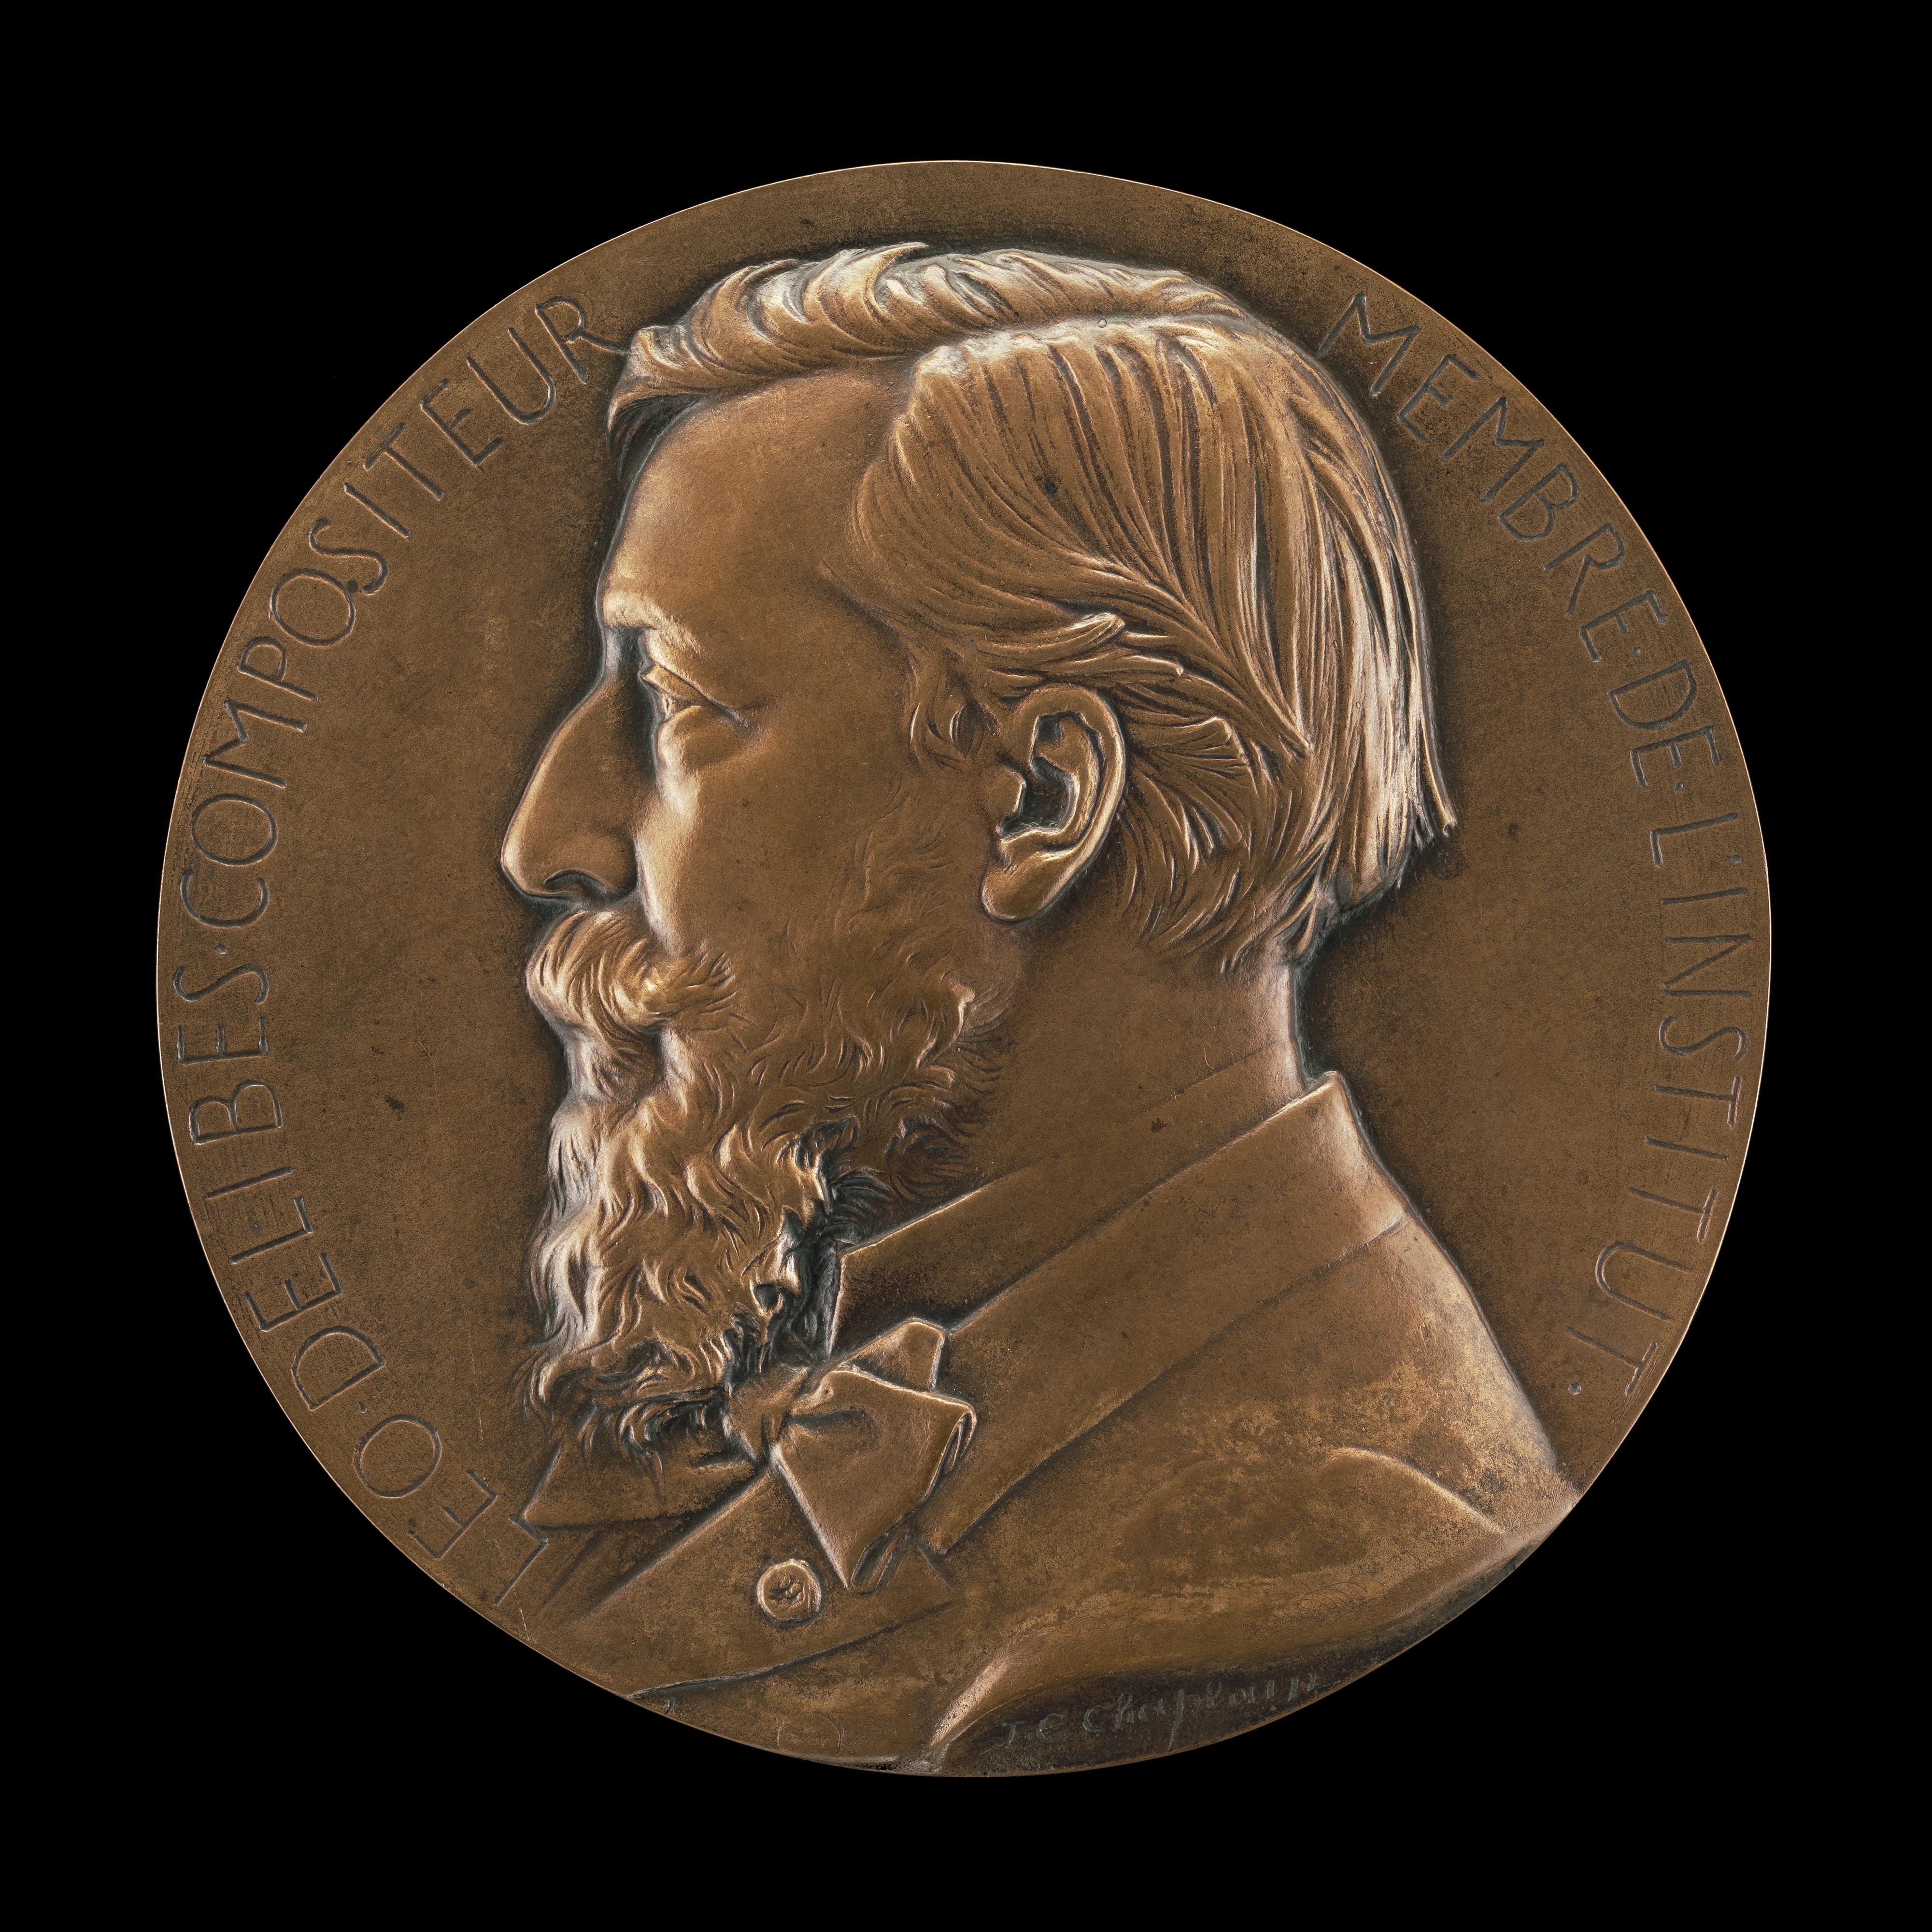 Bronze plaque of Léo Delibes, c. 1870